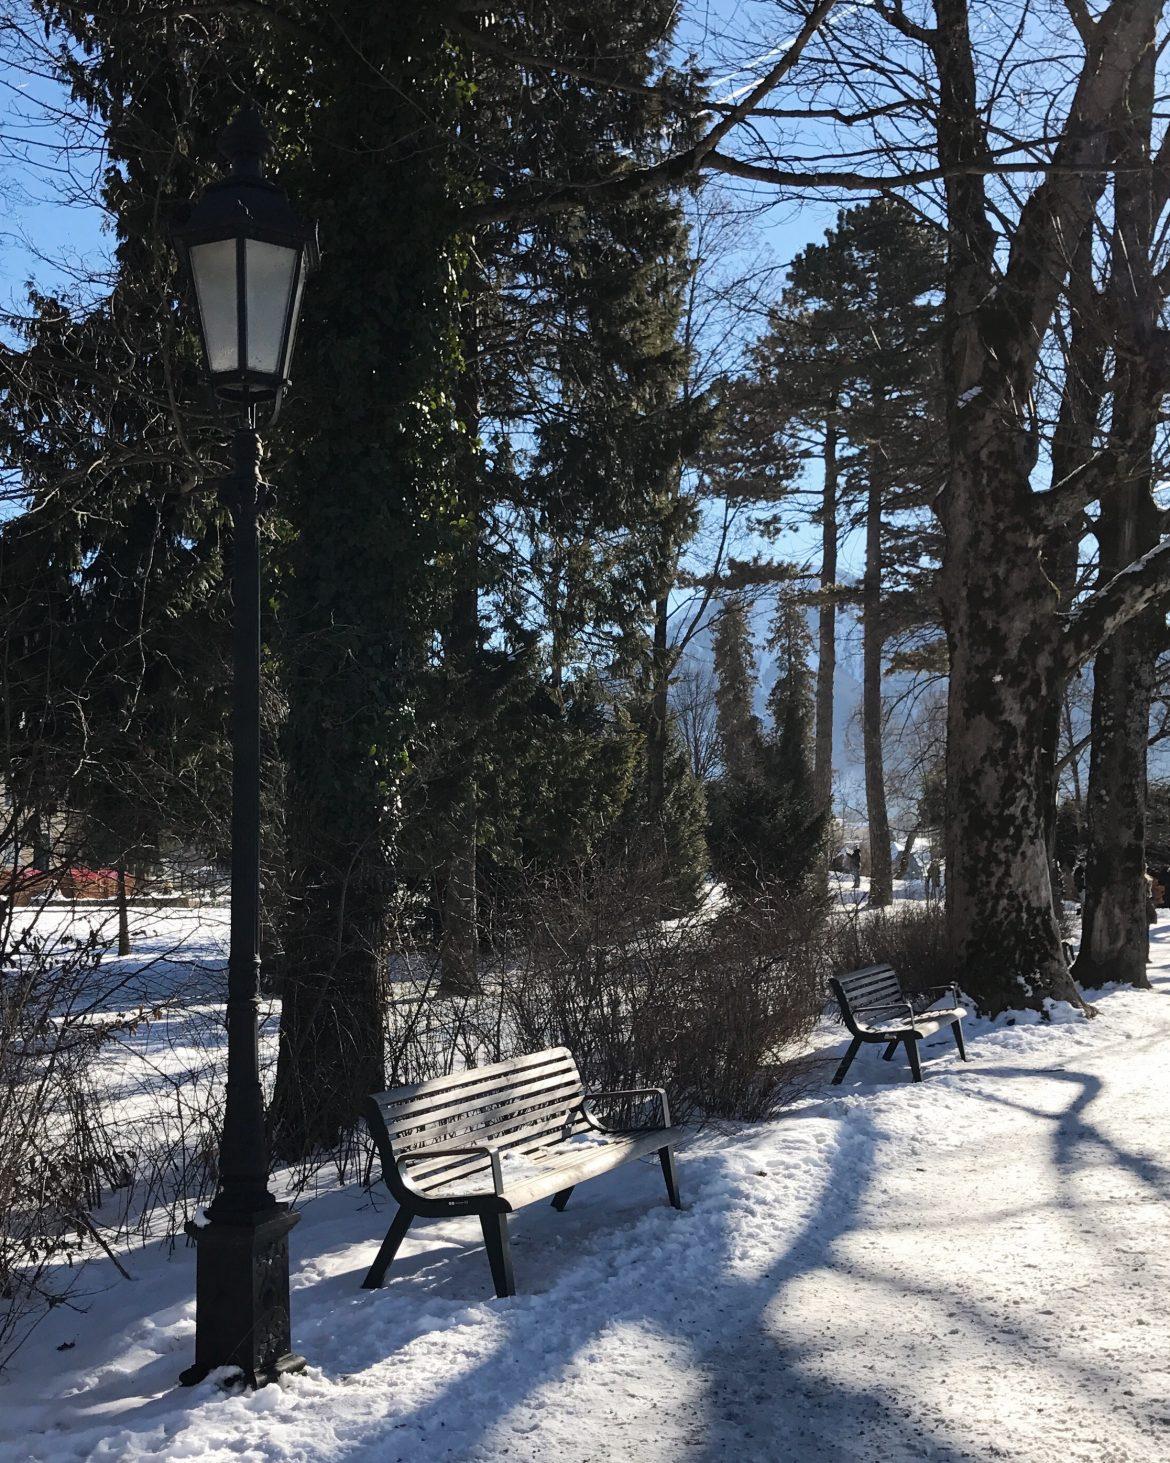 alemanha no inverno parque